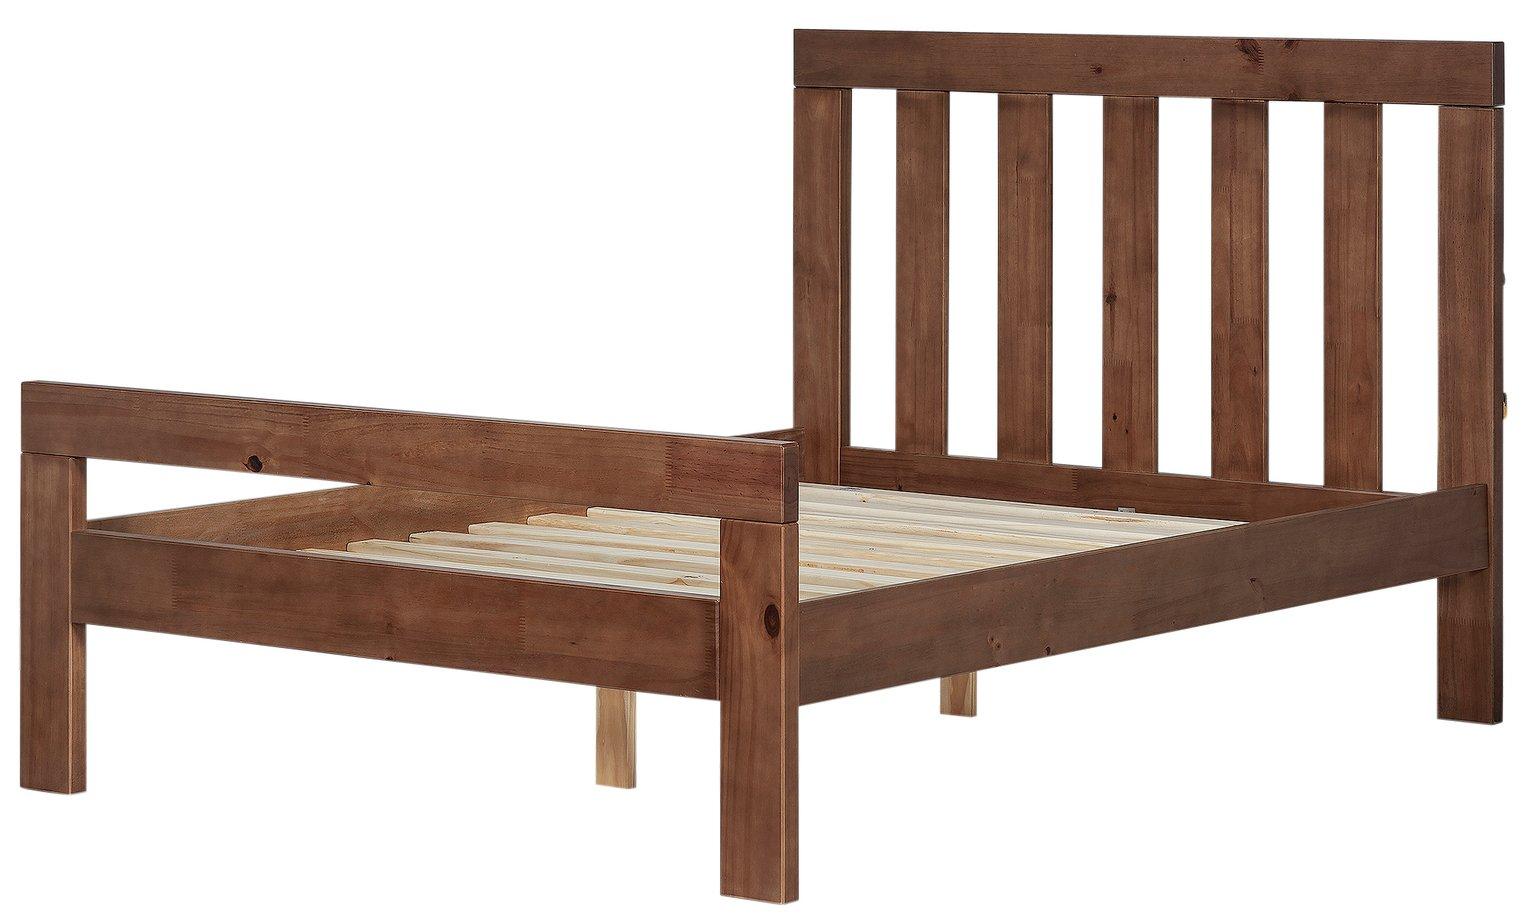 Argos Home Chile Kingsize Bed Frame - Dark Stain